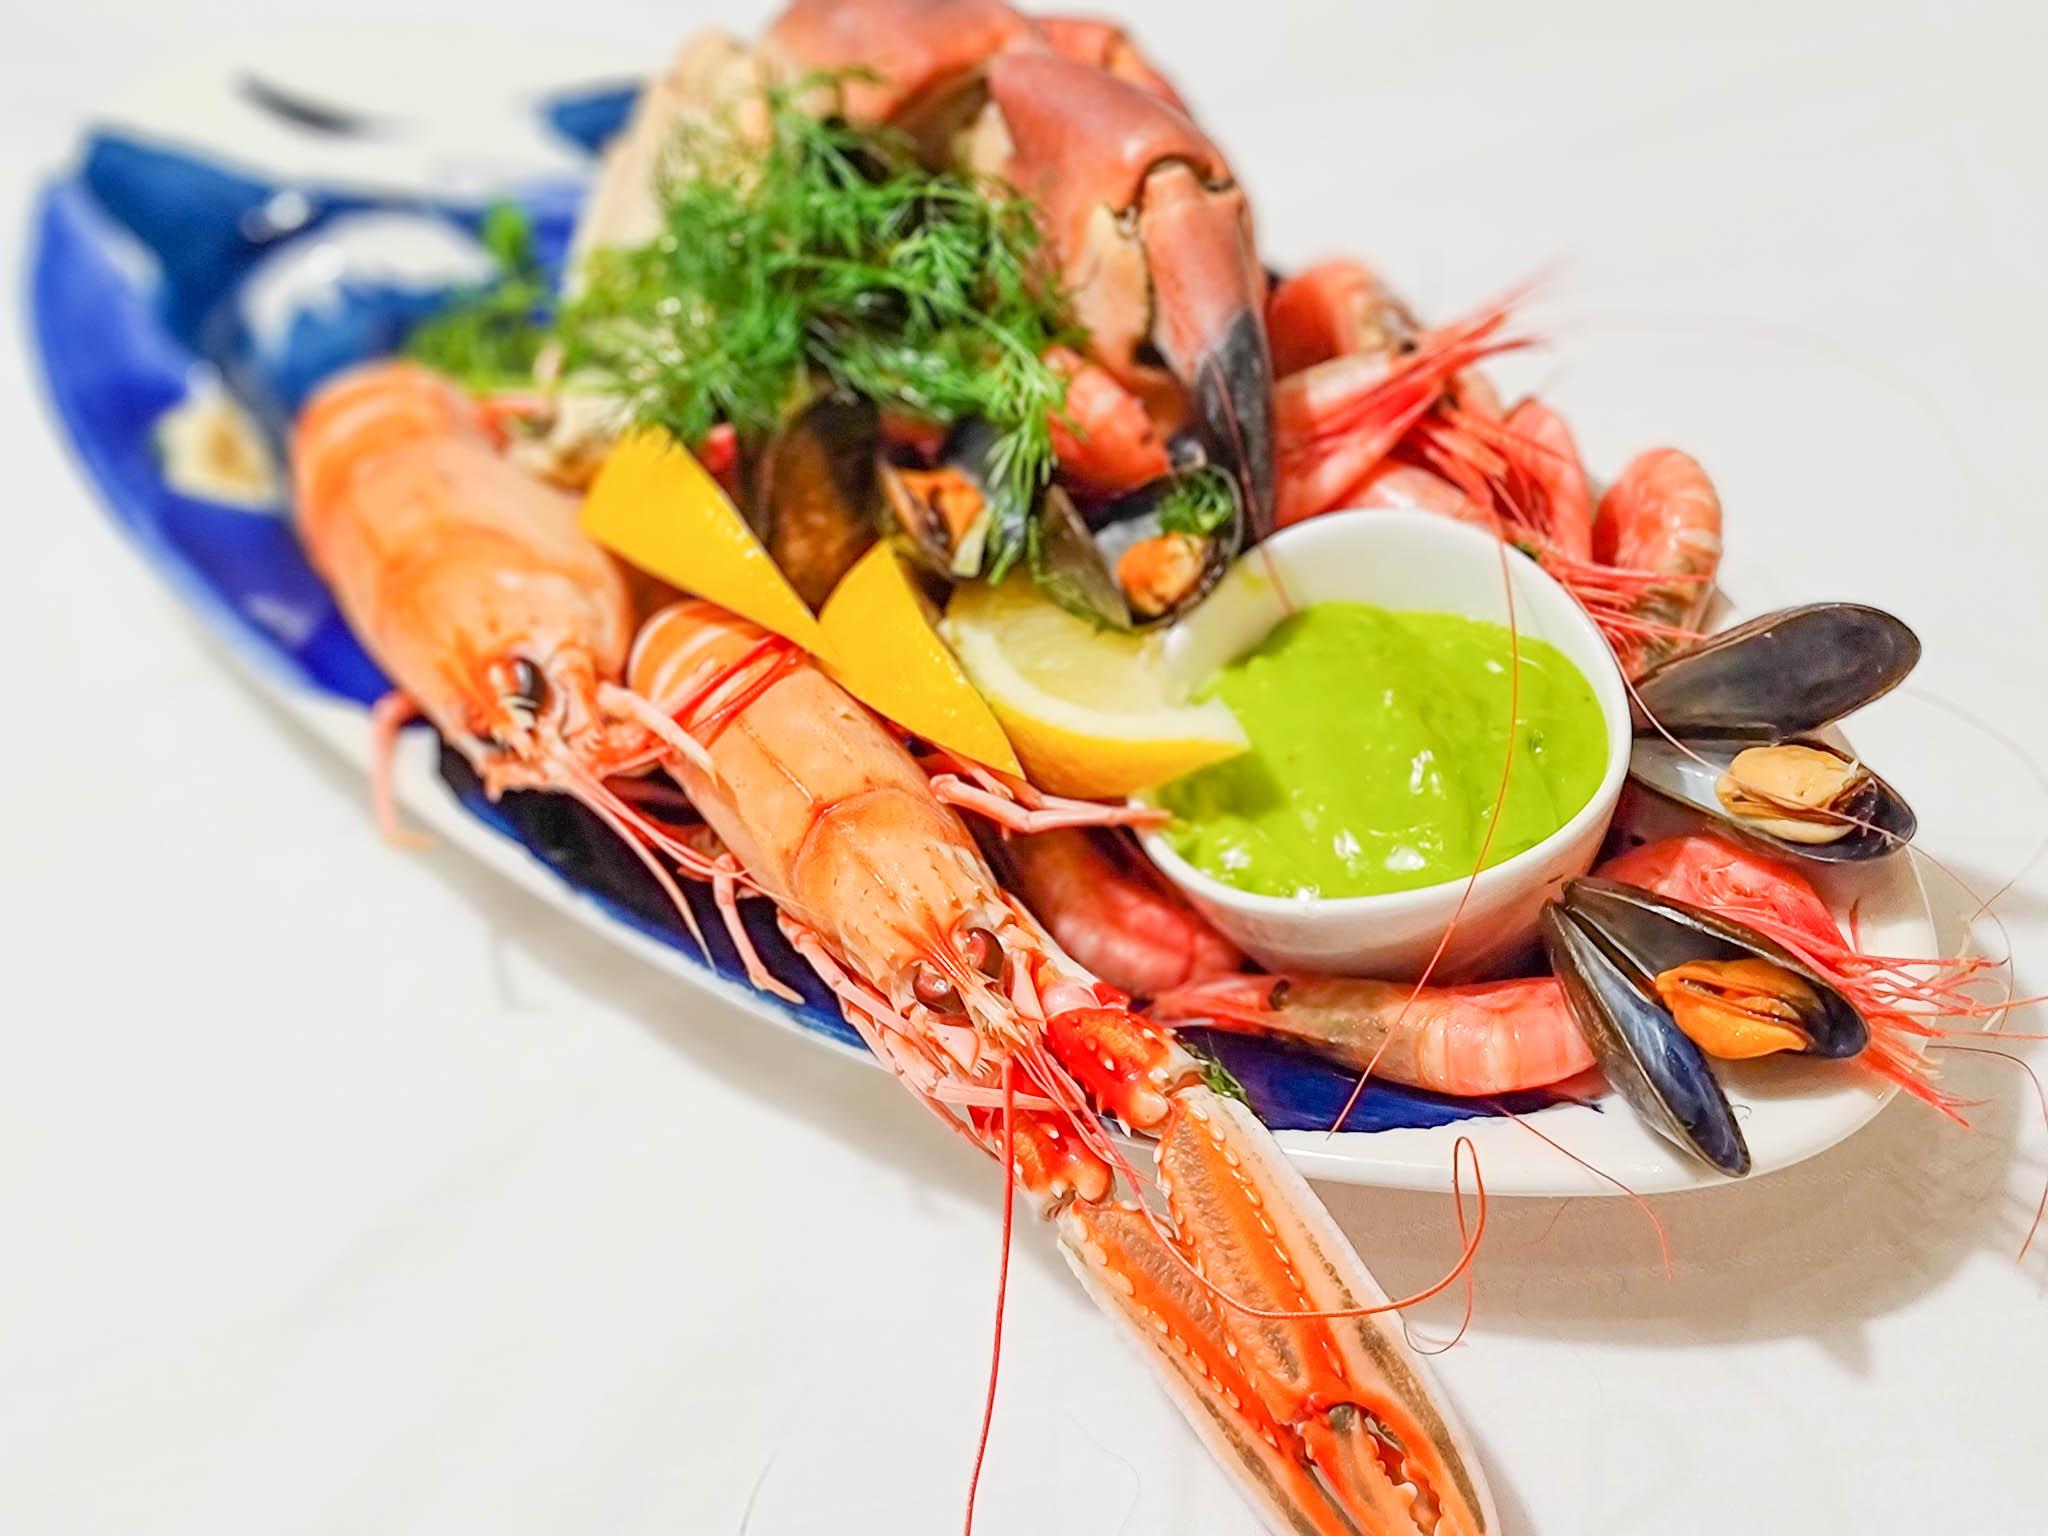 A shellfish platter